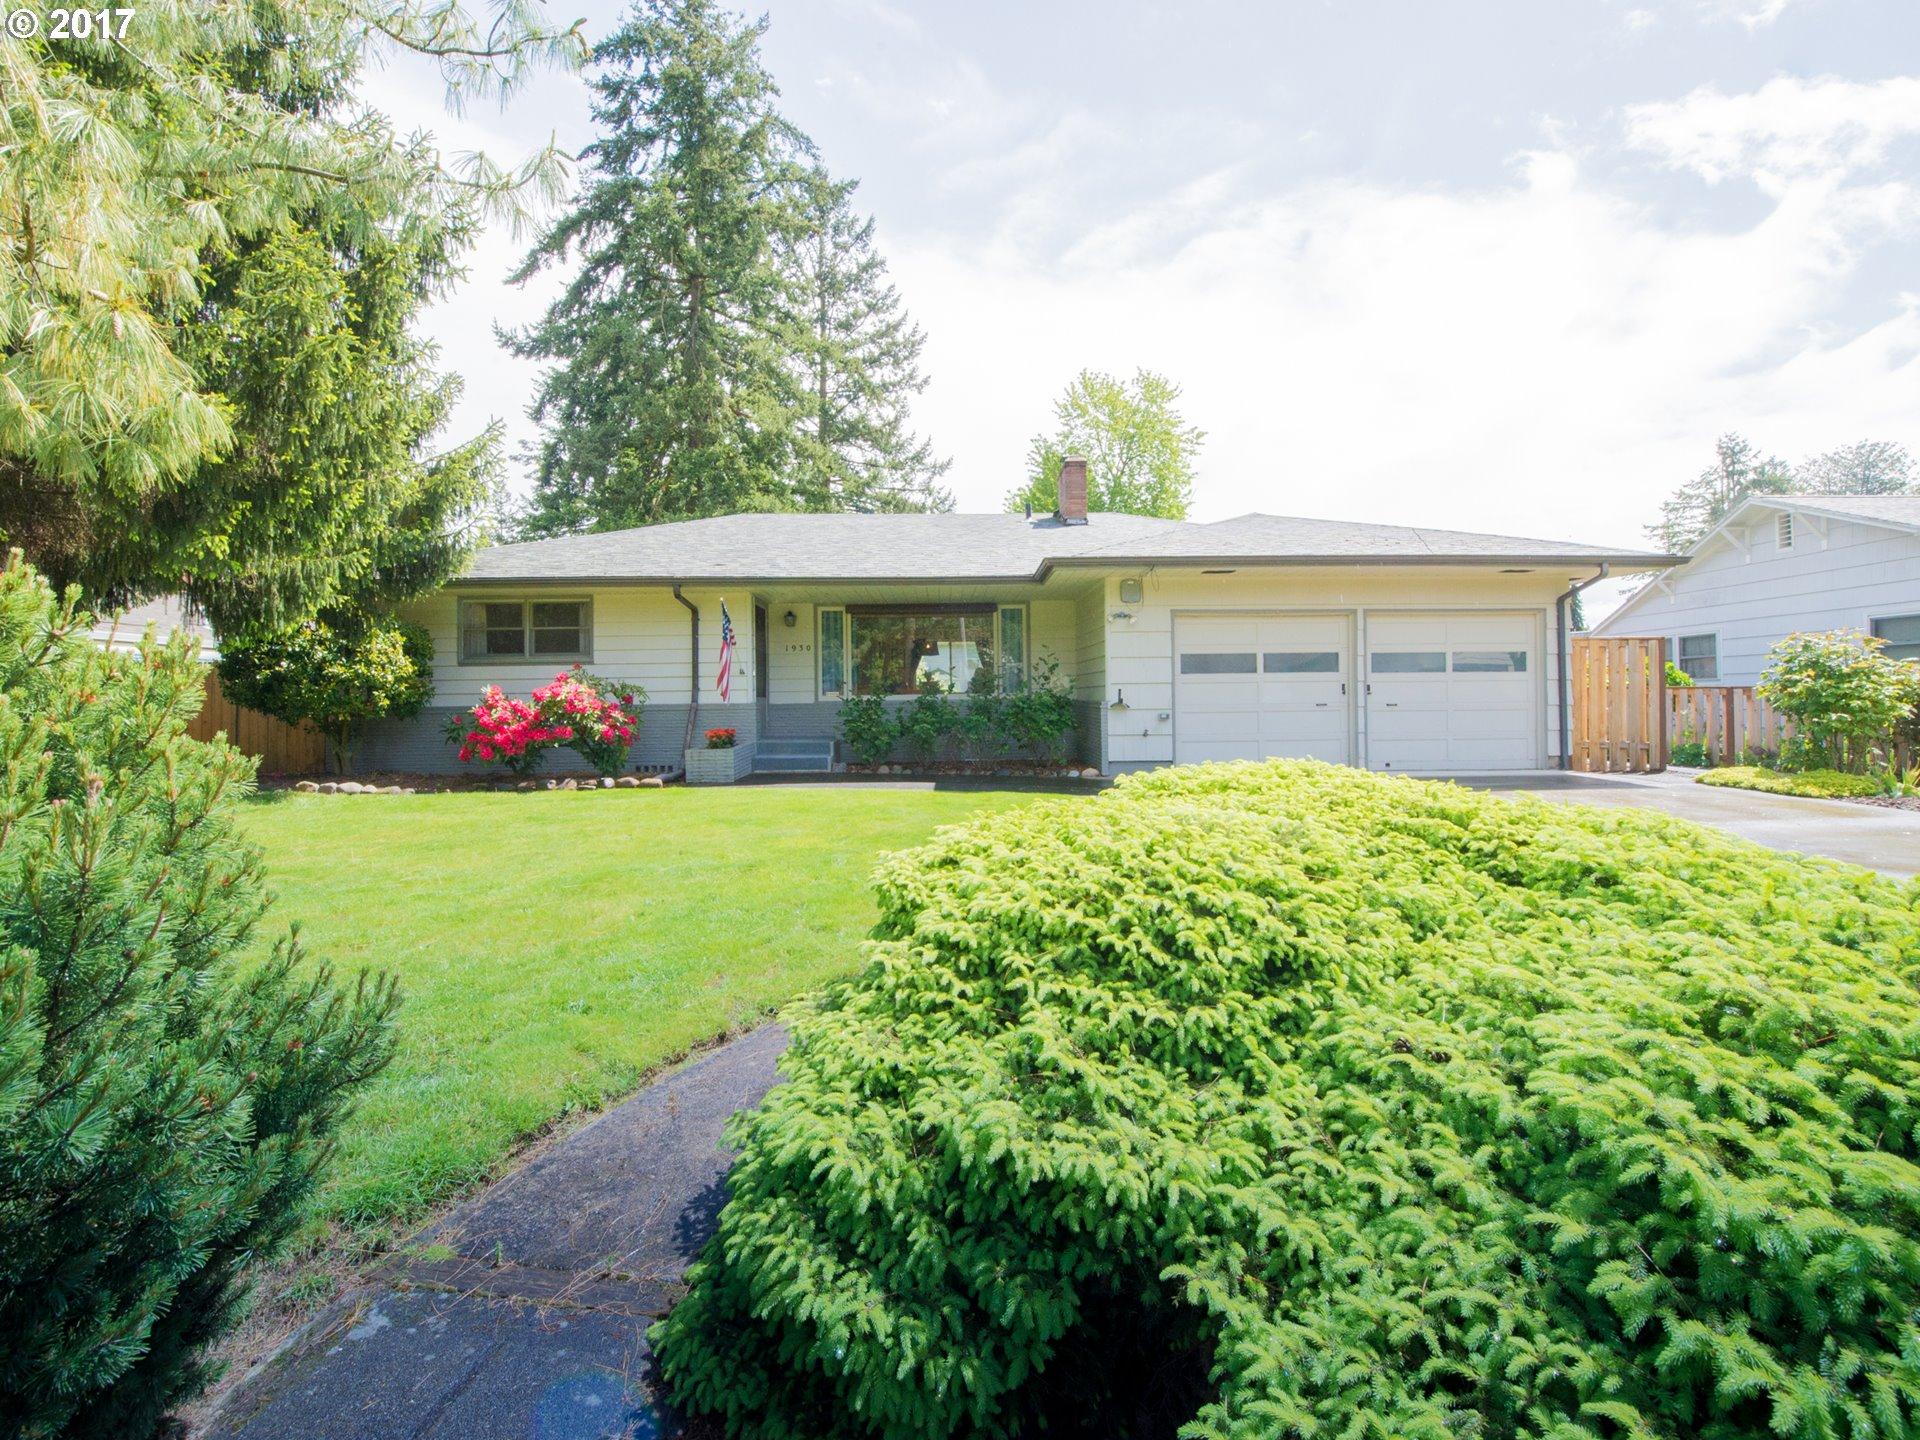 1930 NE 140TH AVE Portland, OR 97230 - MLS #: 17636285